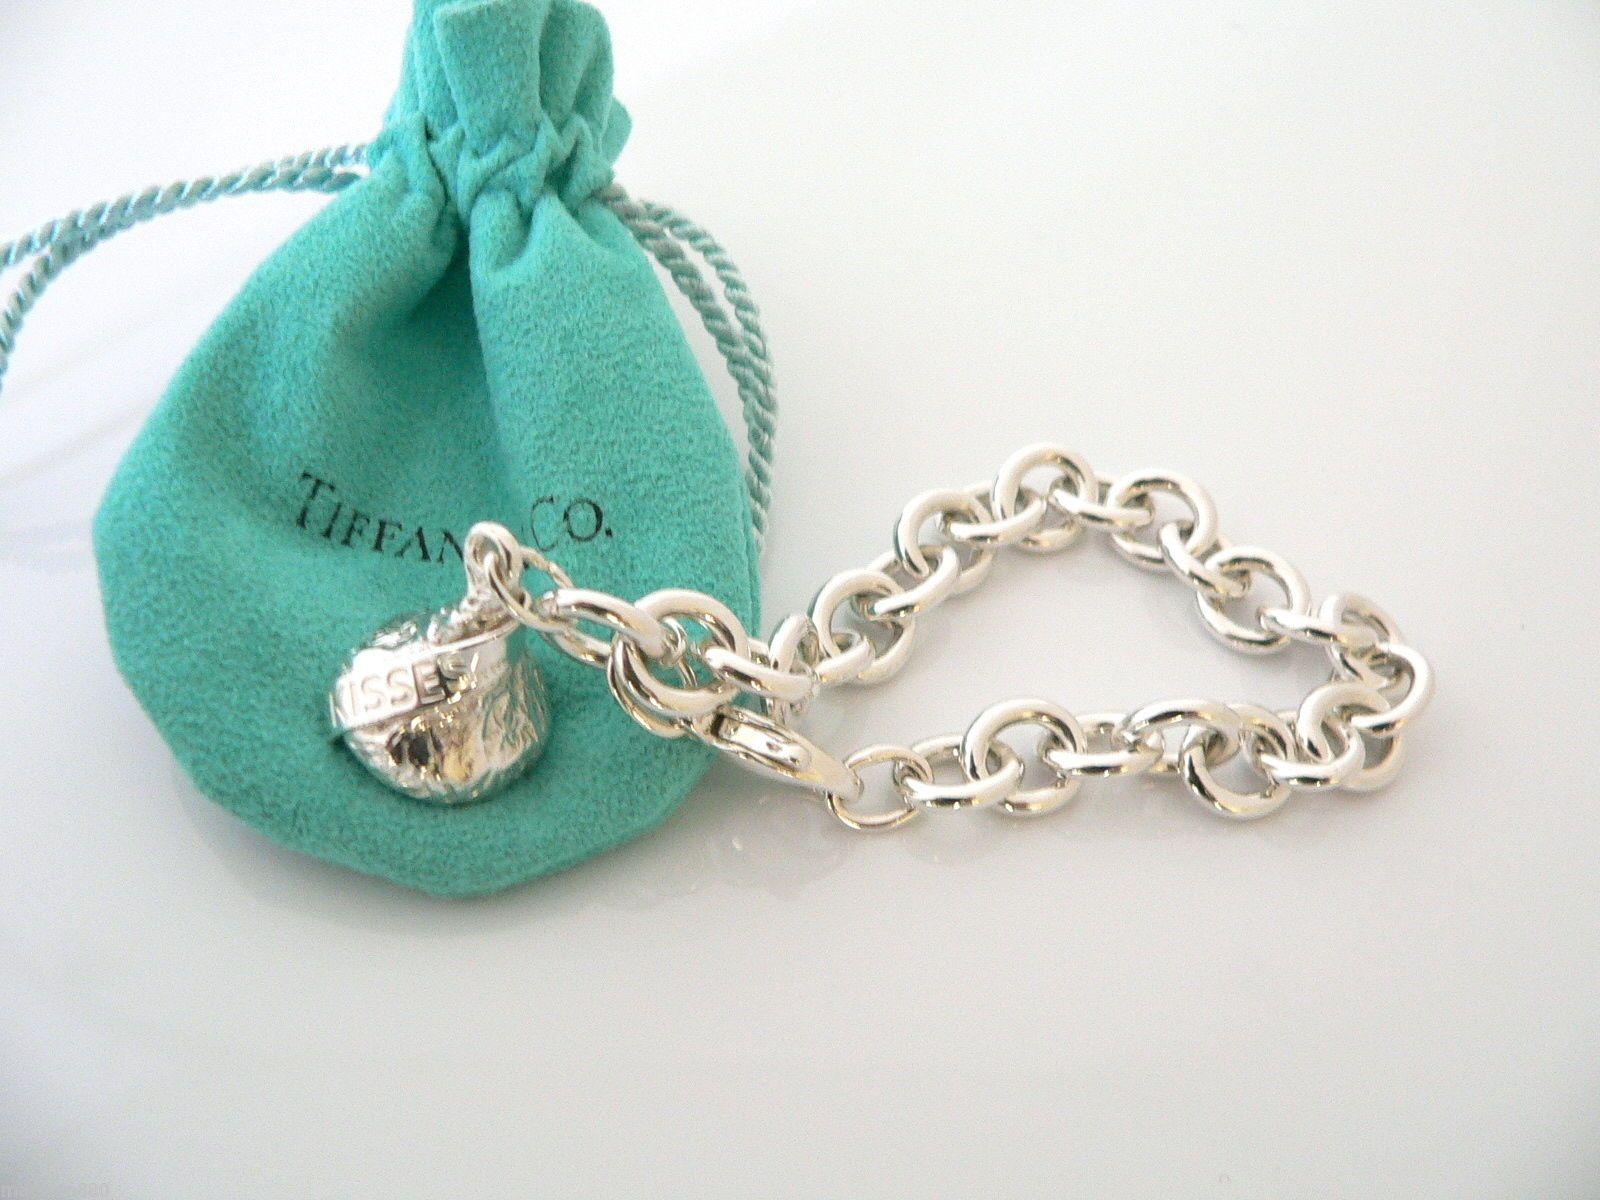 70a0ea037 Tiffany Co silver Hershey Kiss Charm on a sterling bracelet. eBay ...